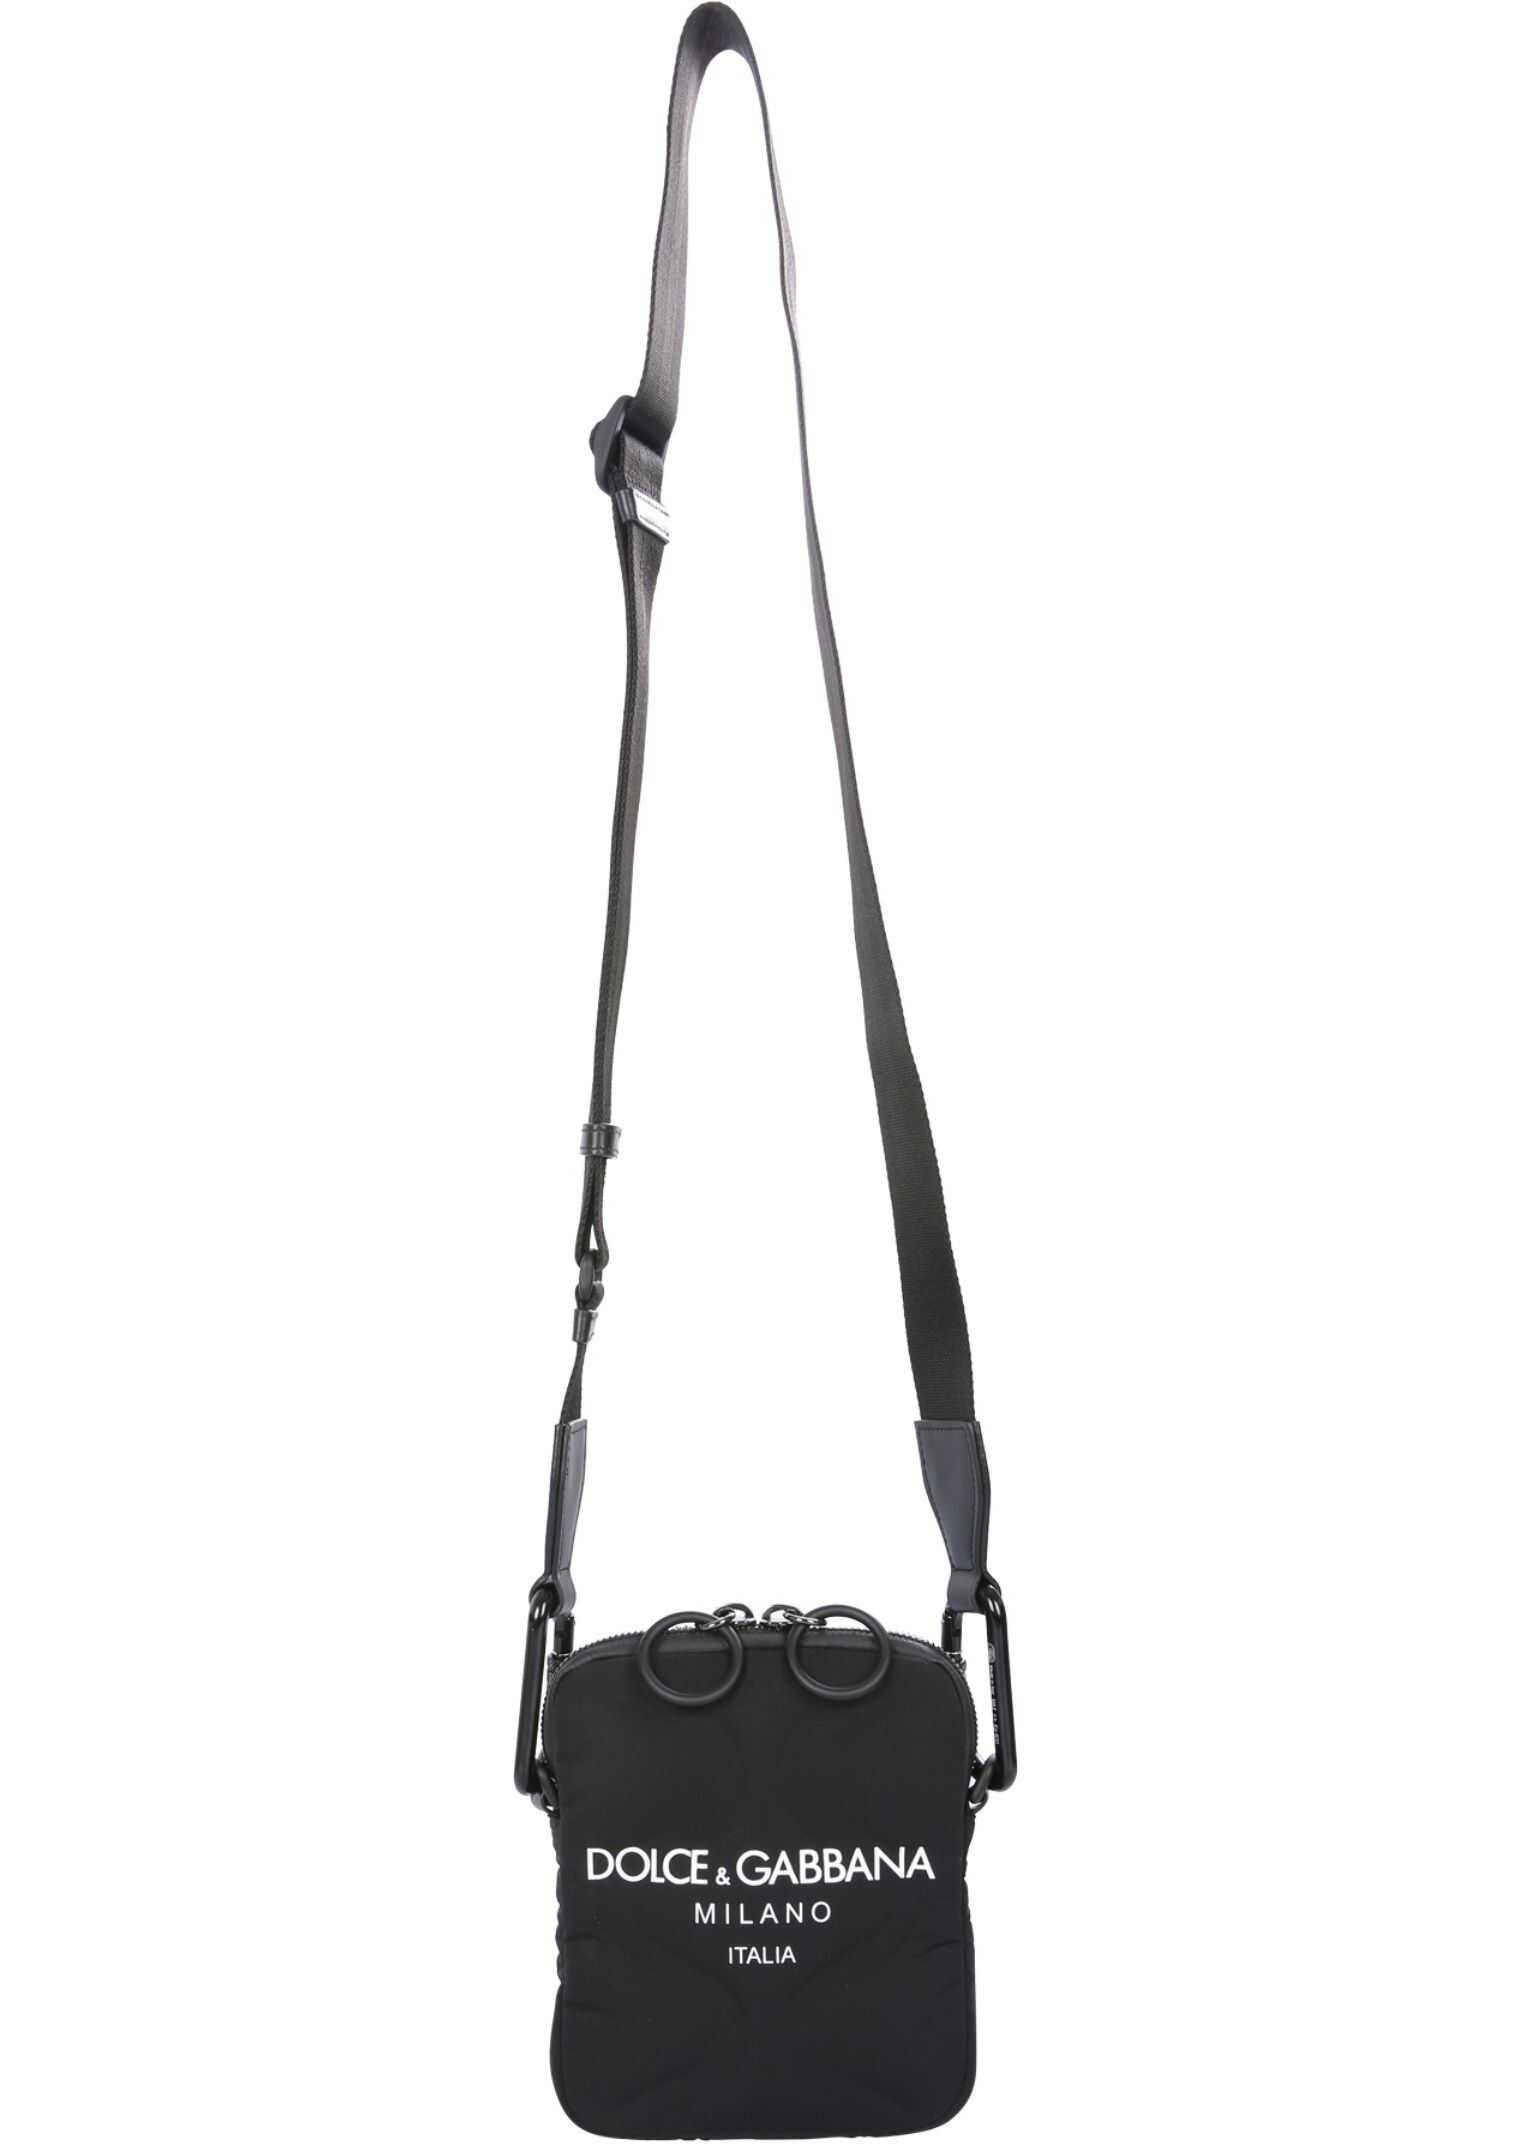 Dolce & Gabbana Bag With Logo BM1848_AW14089690 BLACK imagine b-mall.ro